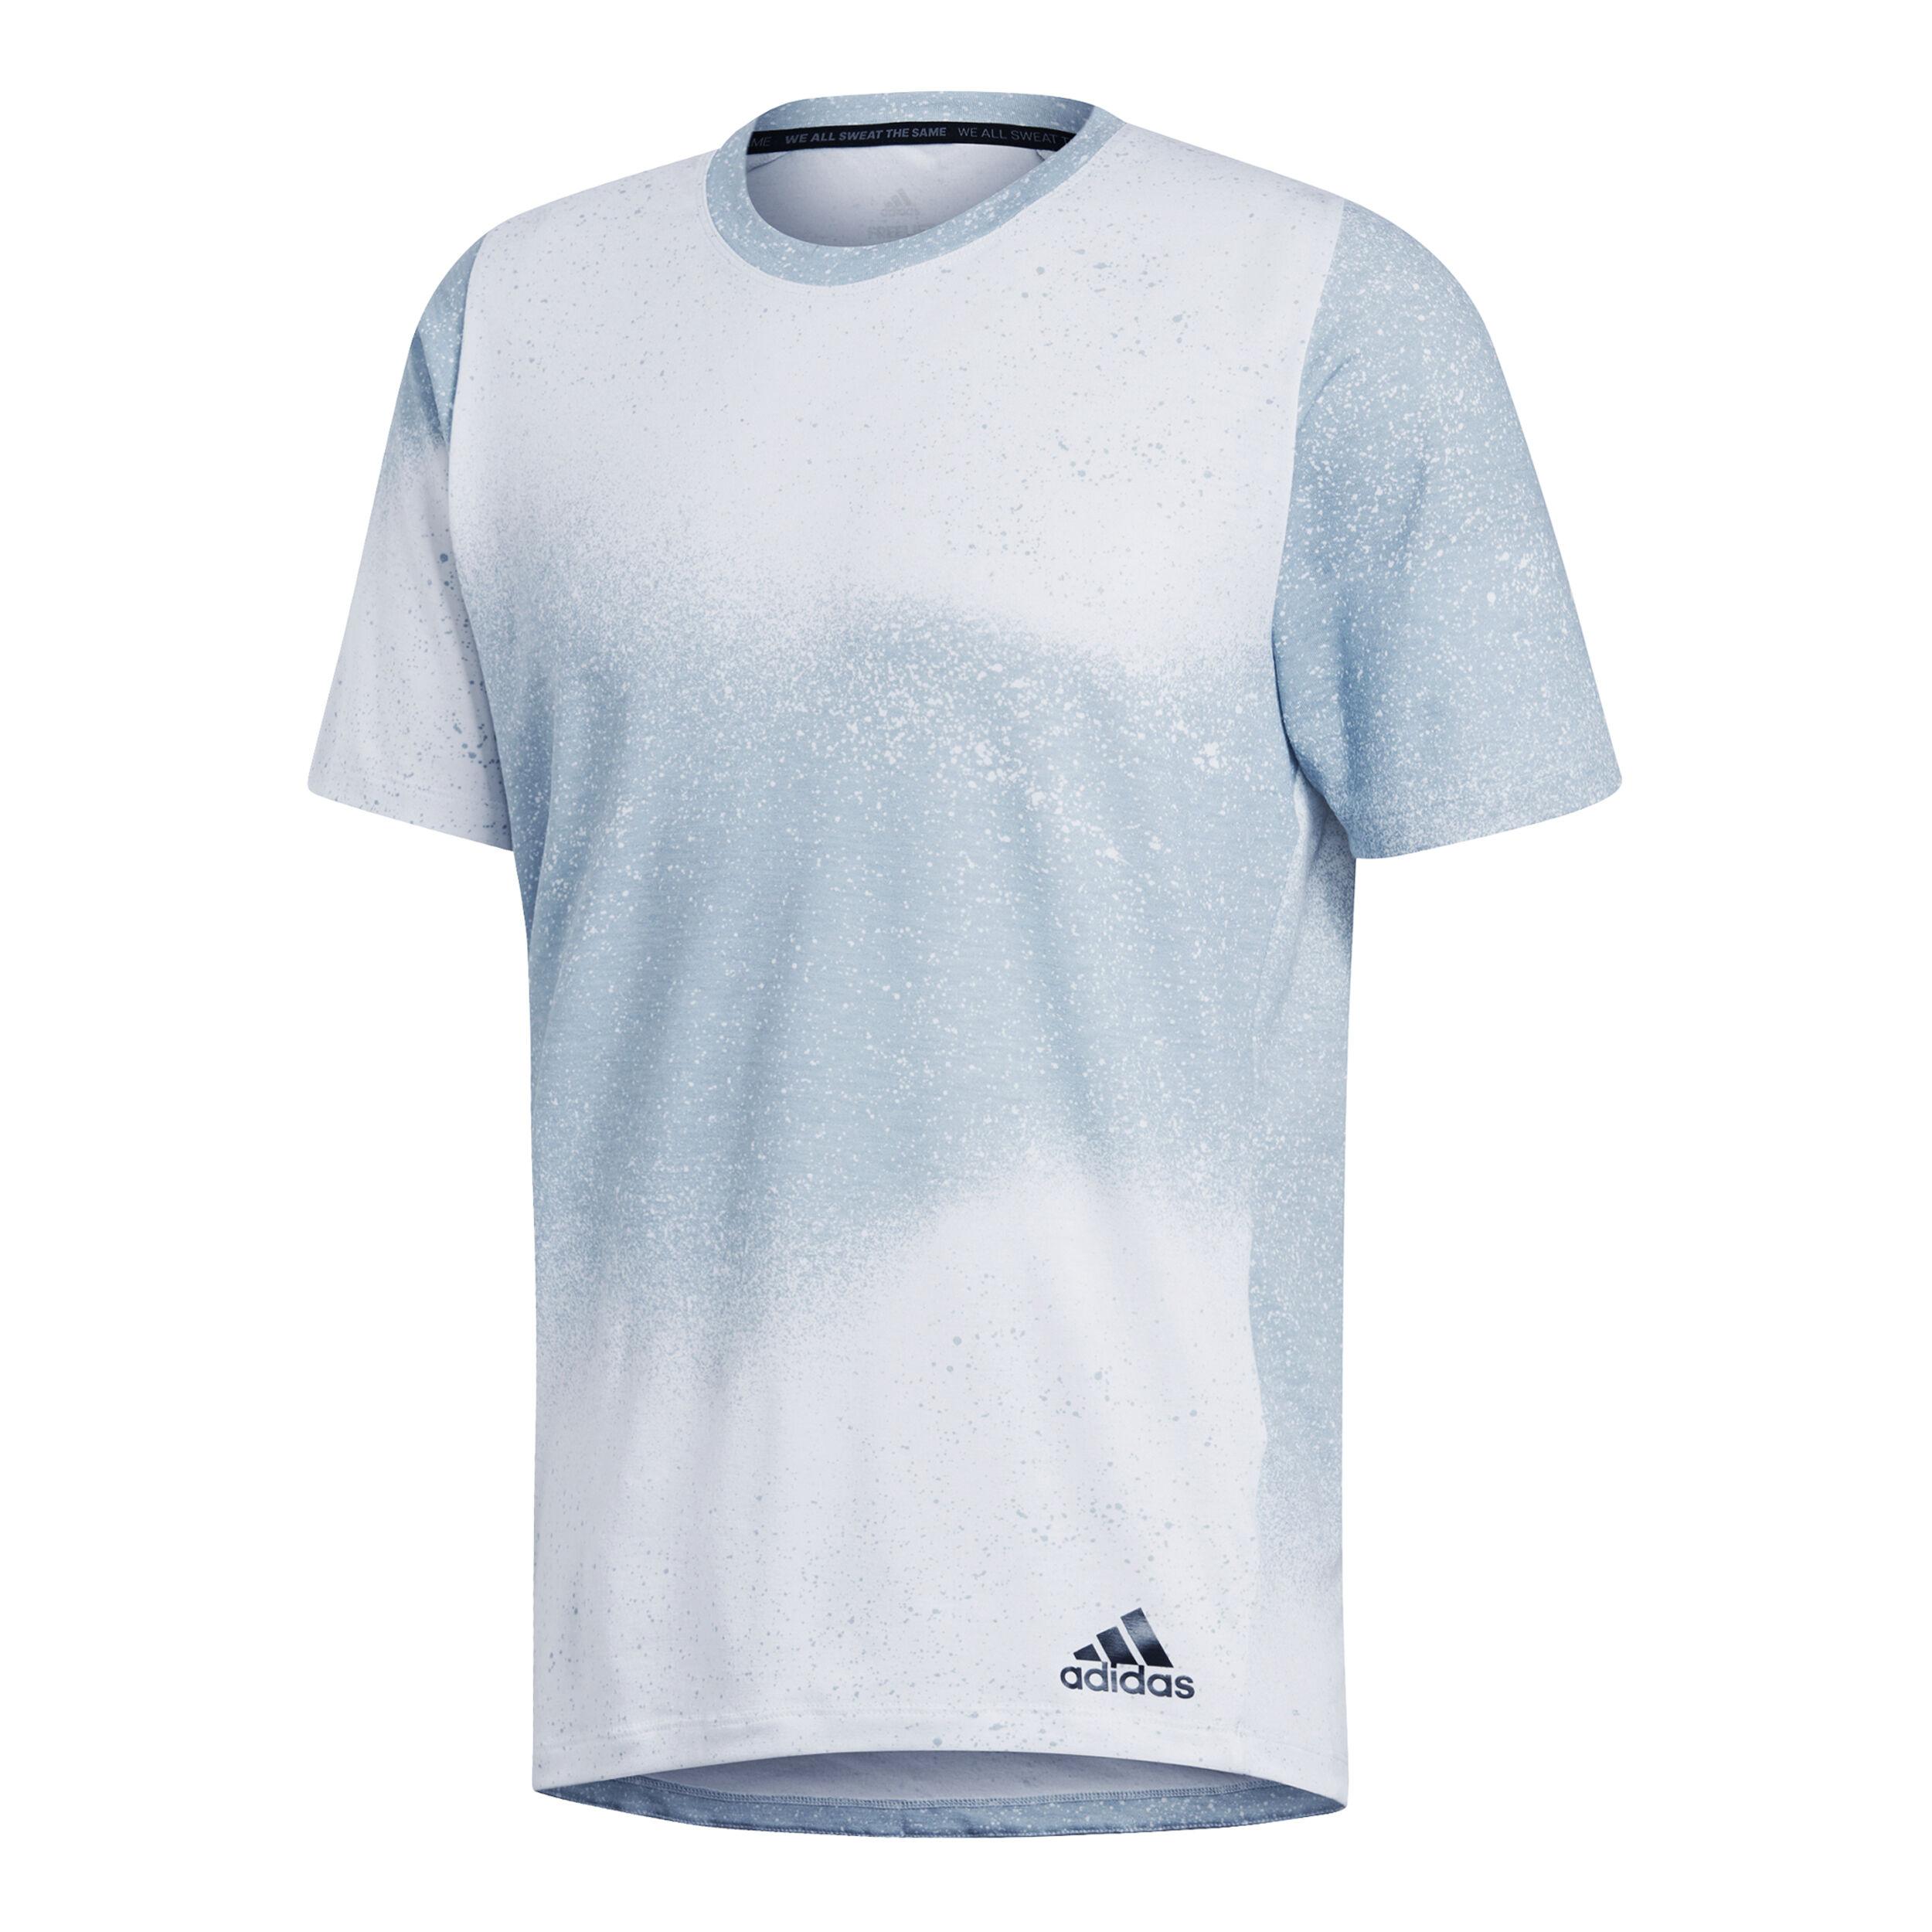 adidas shirts prrusverglaich